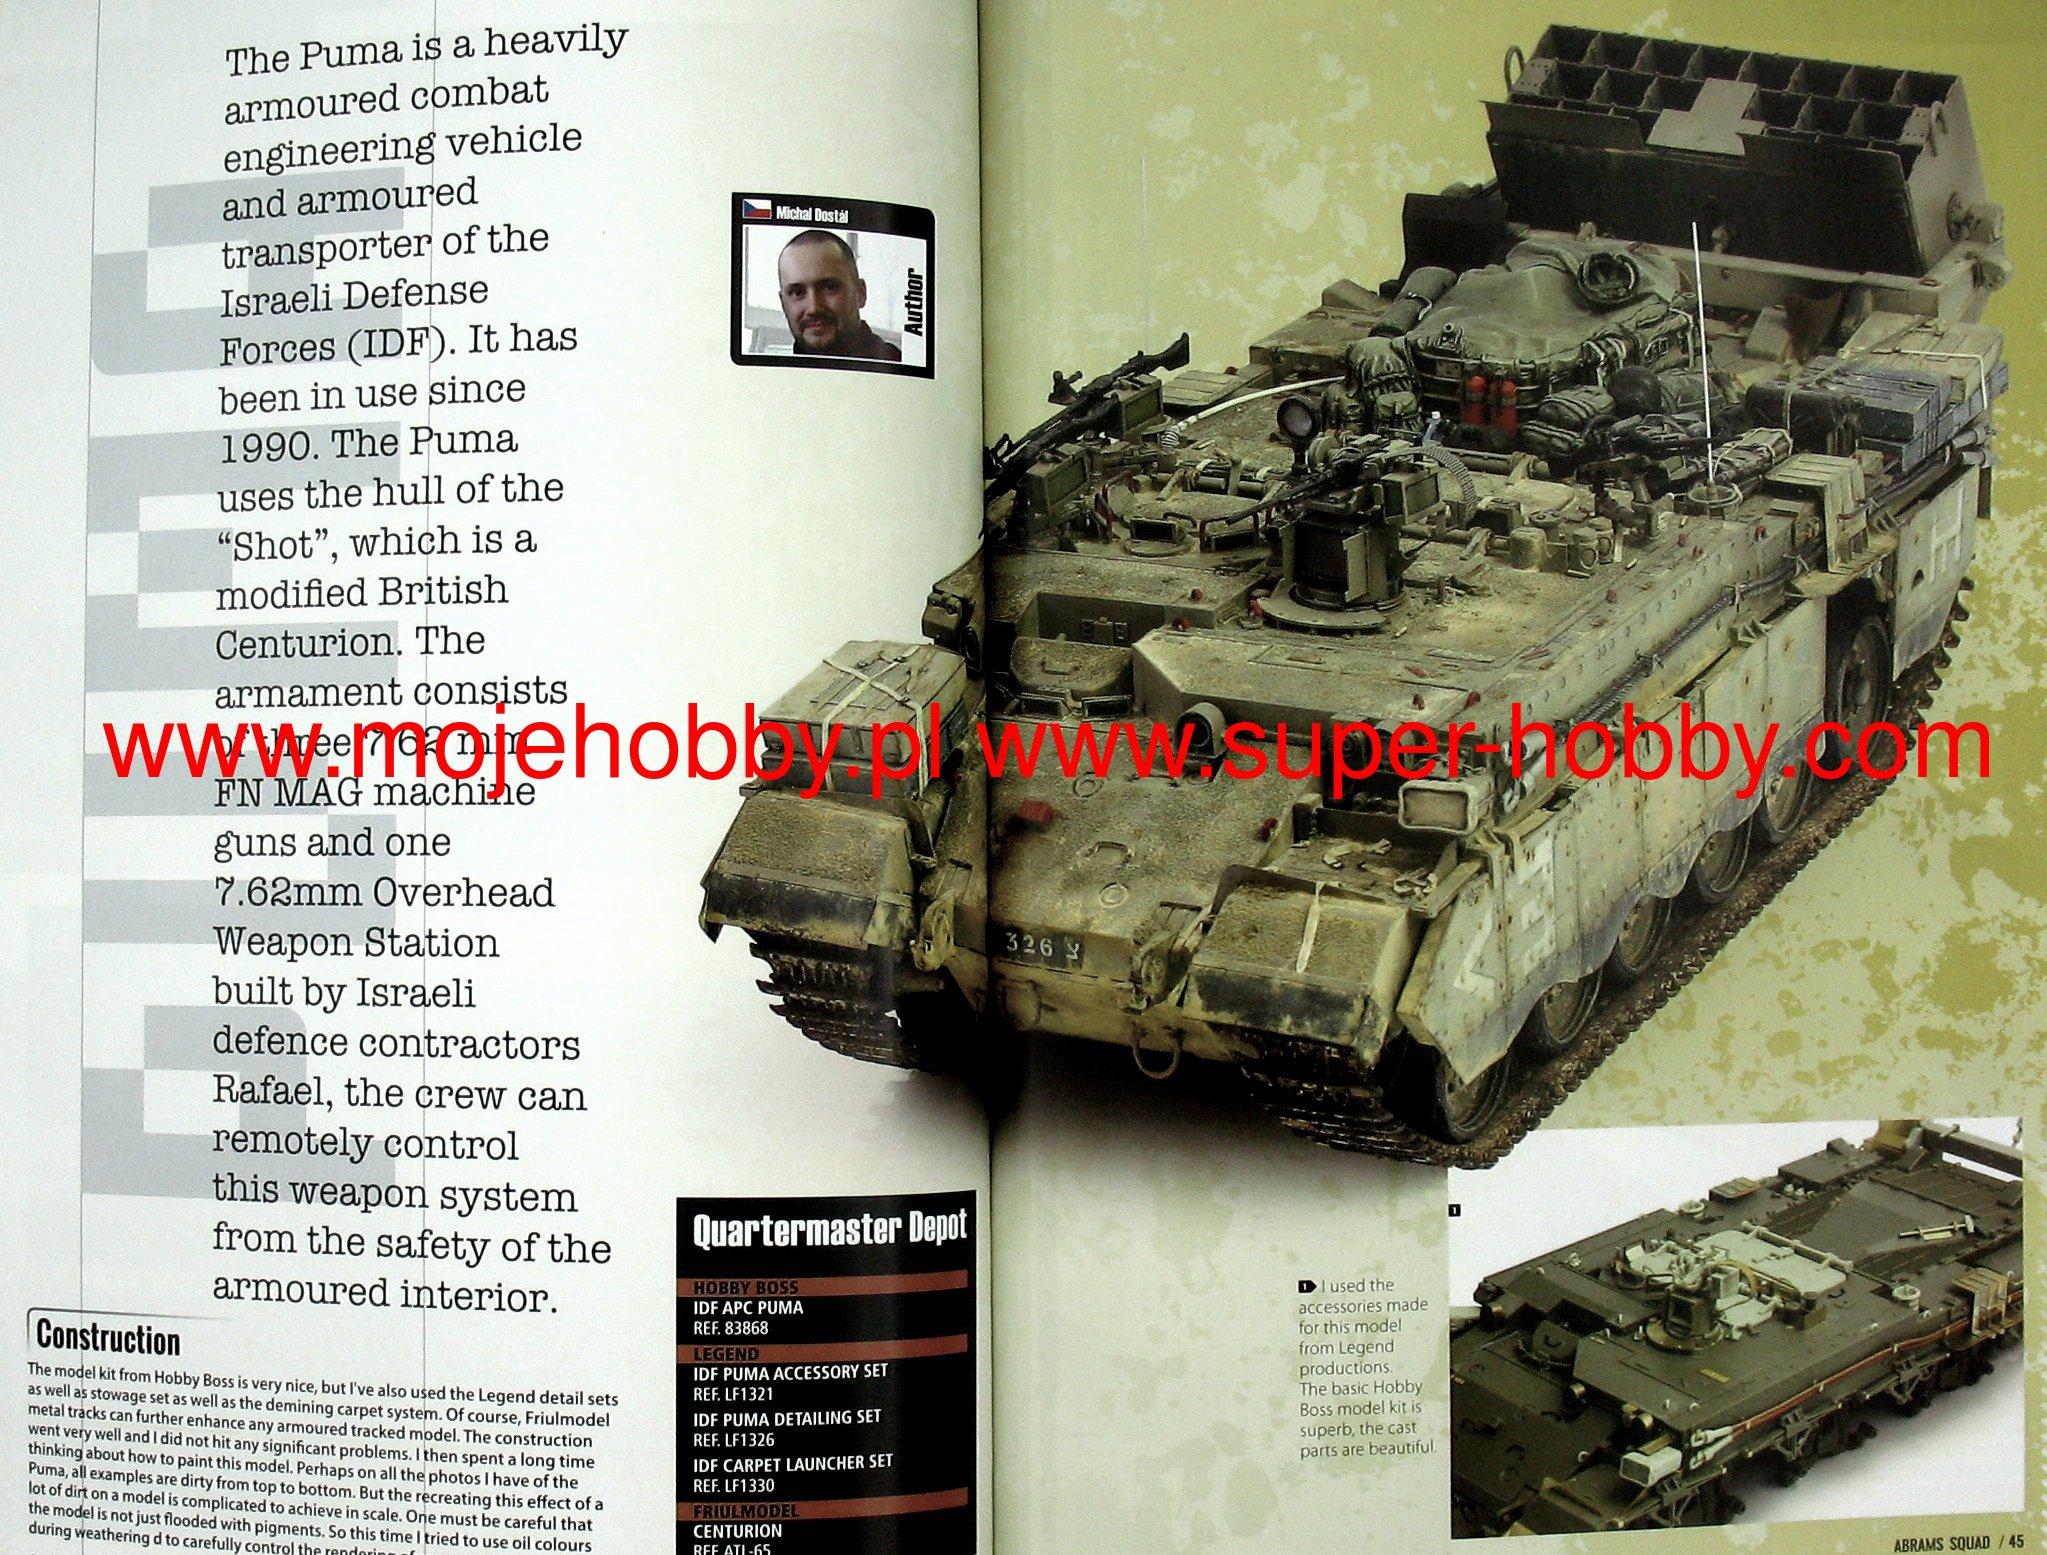 Abrams Squad nr 21 - Leopard Turkish in Syria, M88 In Vietnam RTS: FV-432  Takom